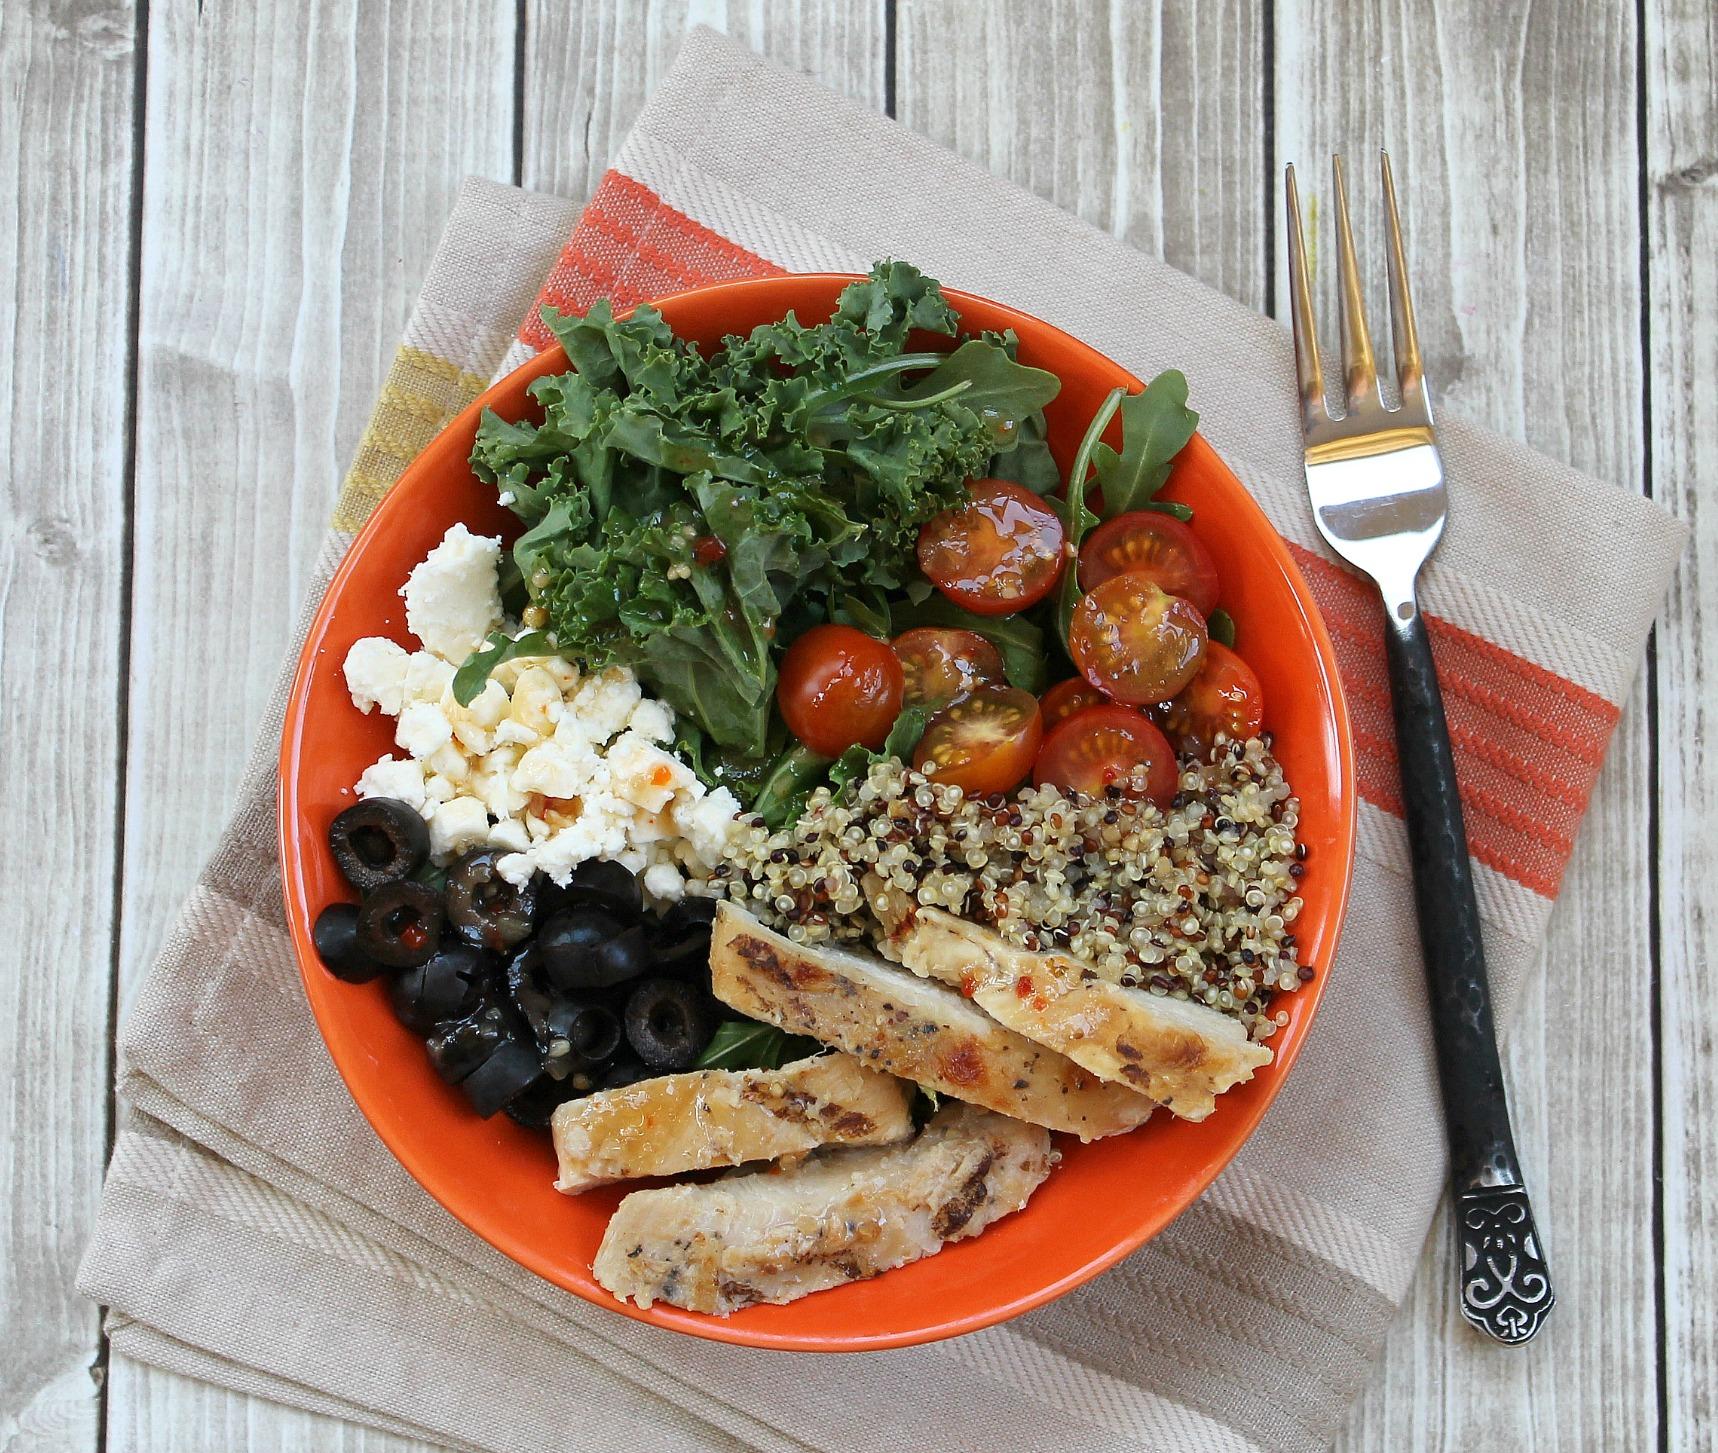 Kale Quinoa Chicken Salad Delicious Economical One Bowl Meal